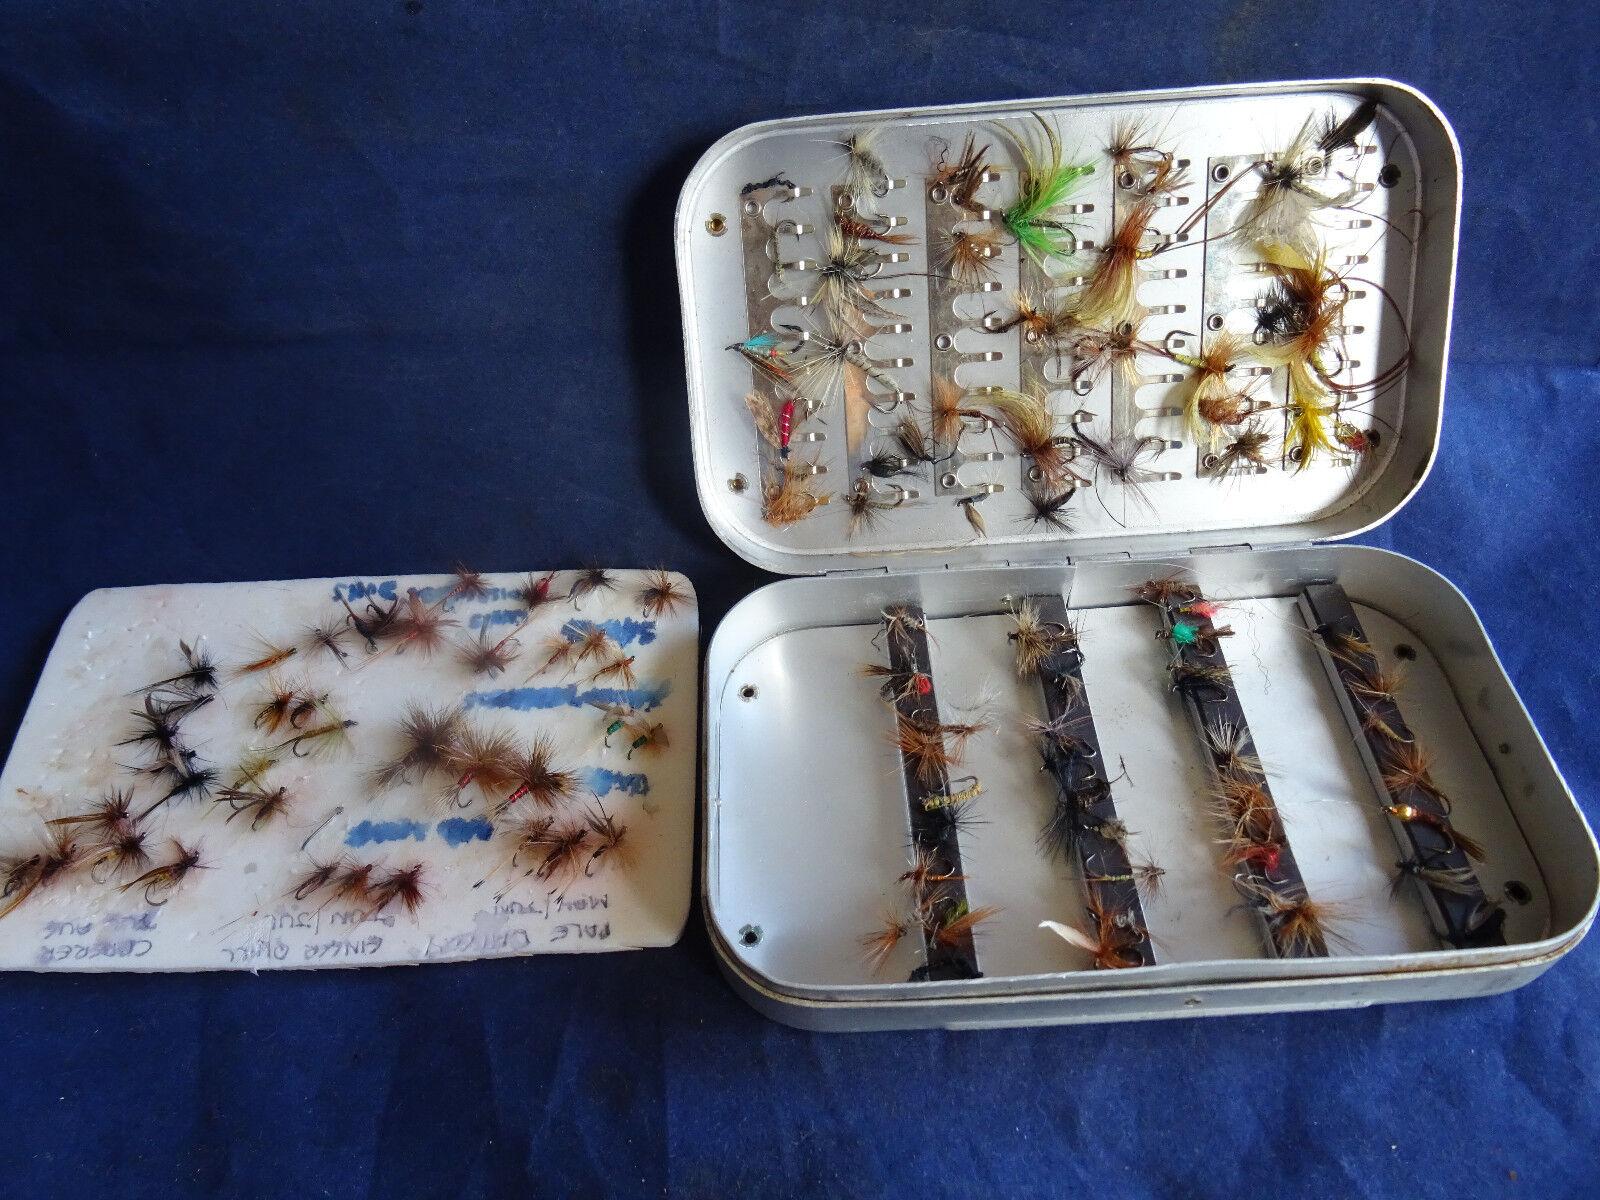 A SCARCE MODEL WHEATLEY SILMALLOY 70 CLIP MAGNETIC STRIP FLY FISHING BOX & FLIES